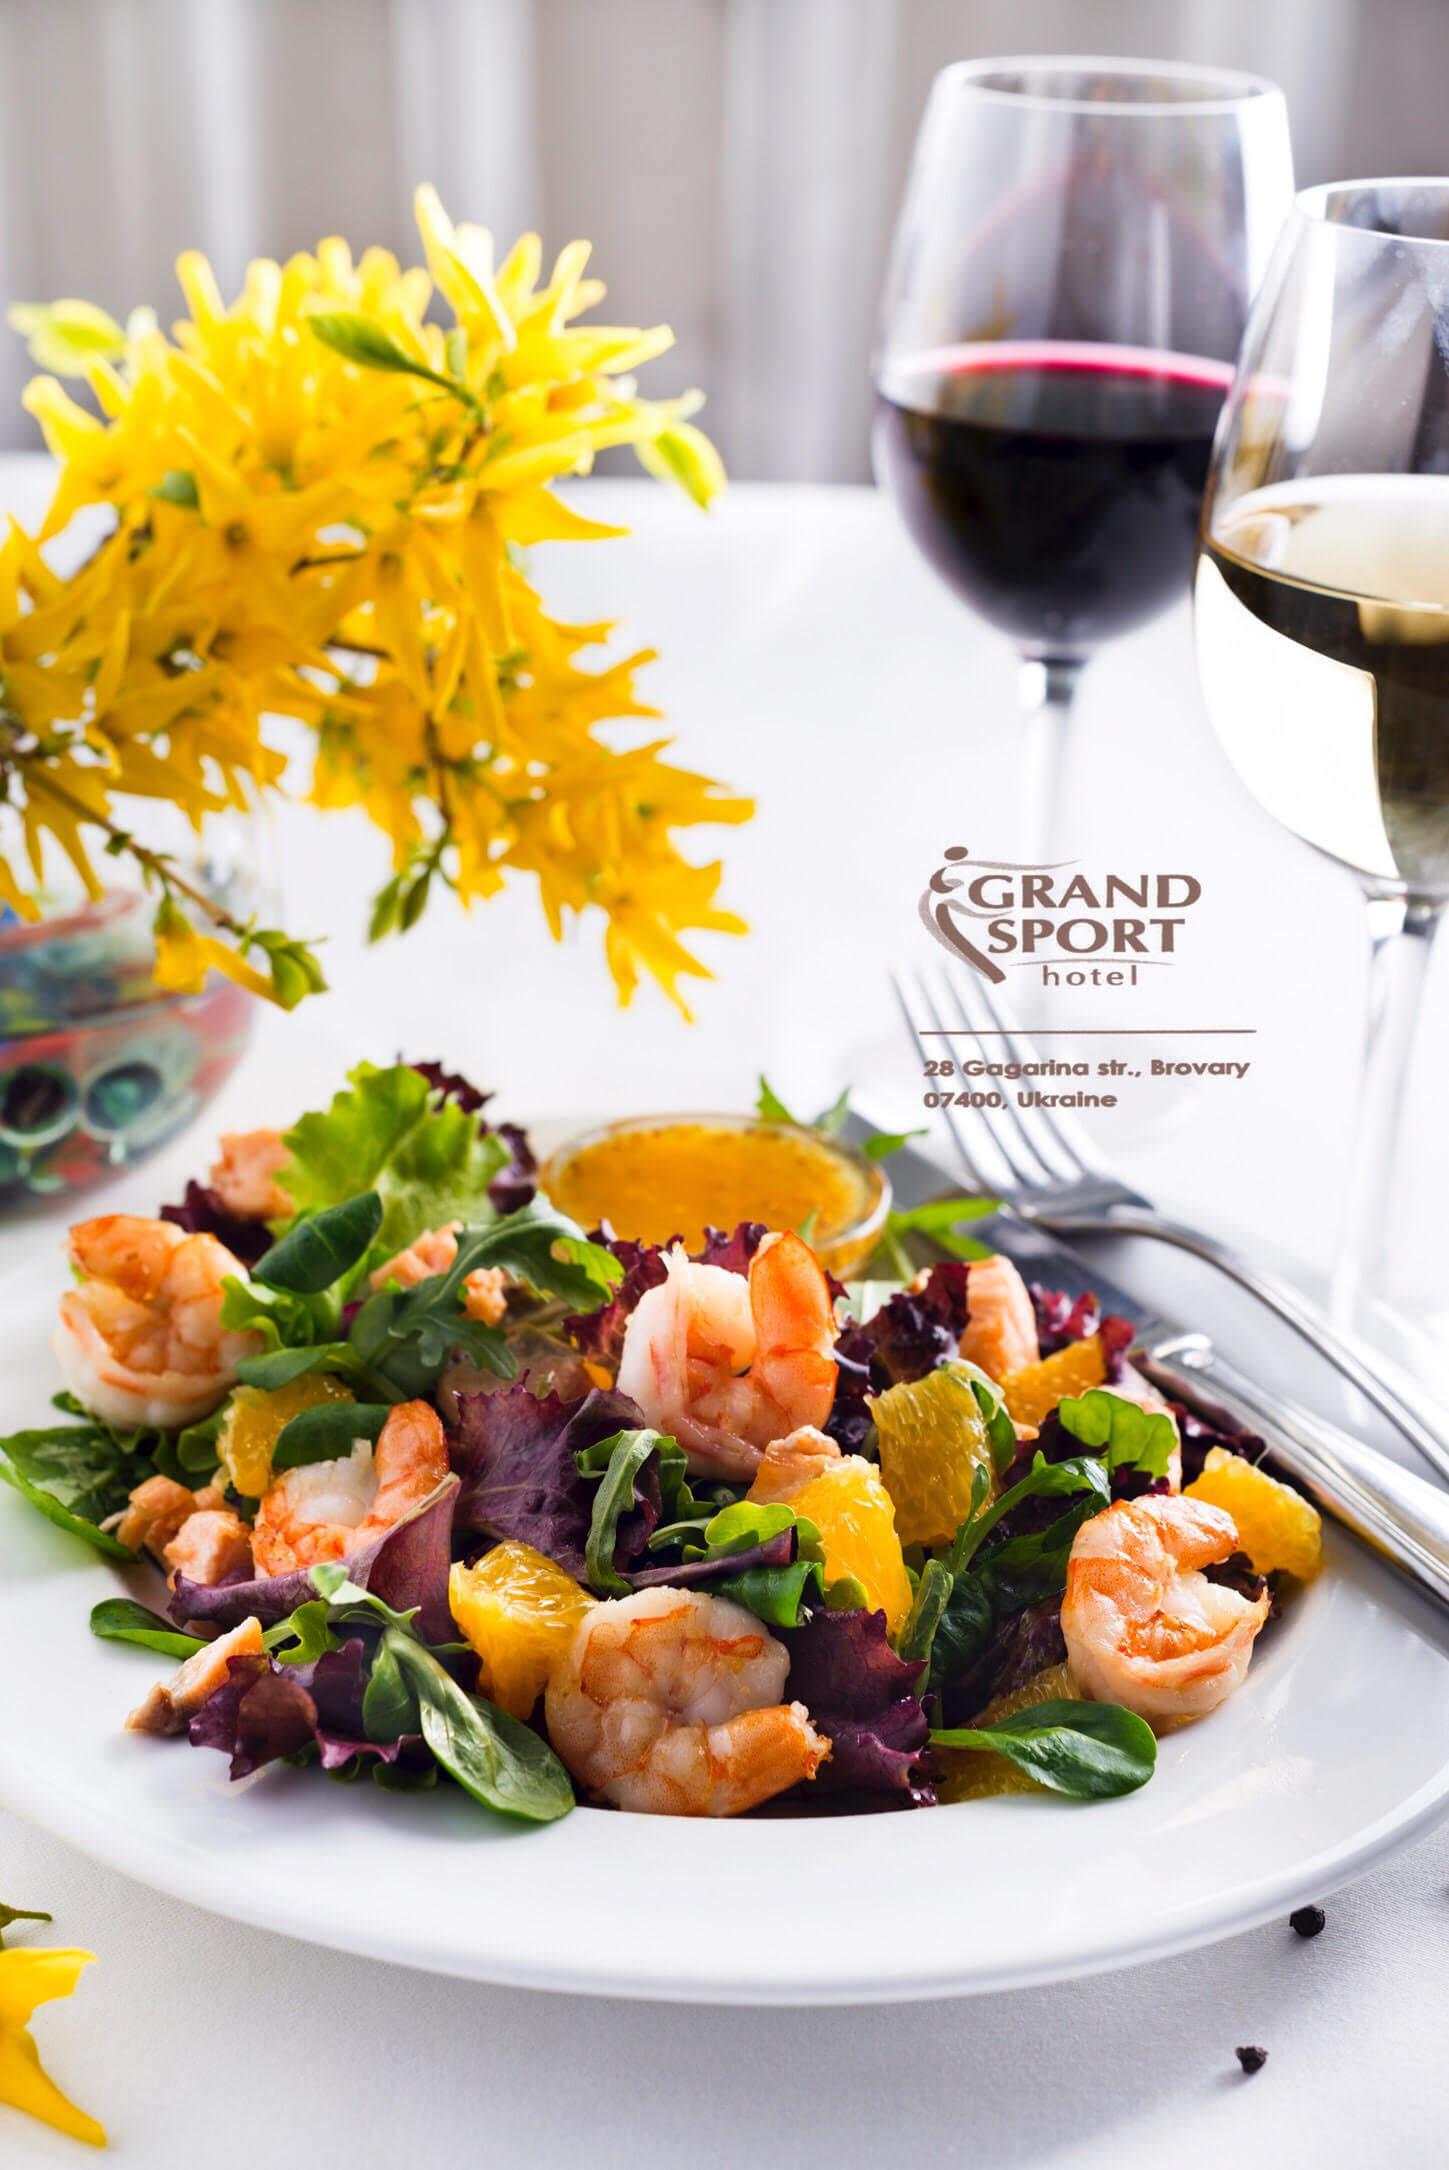 салат с креветками Бровары